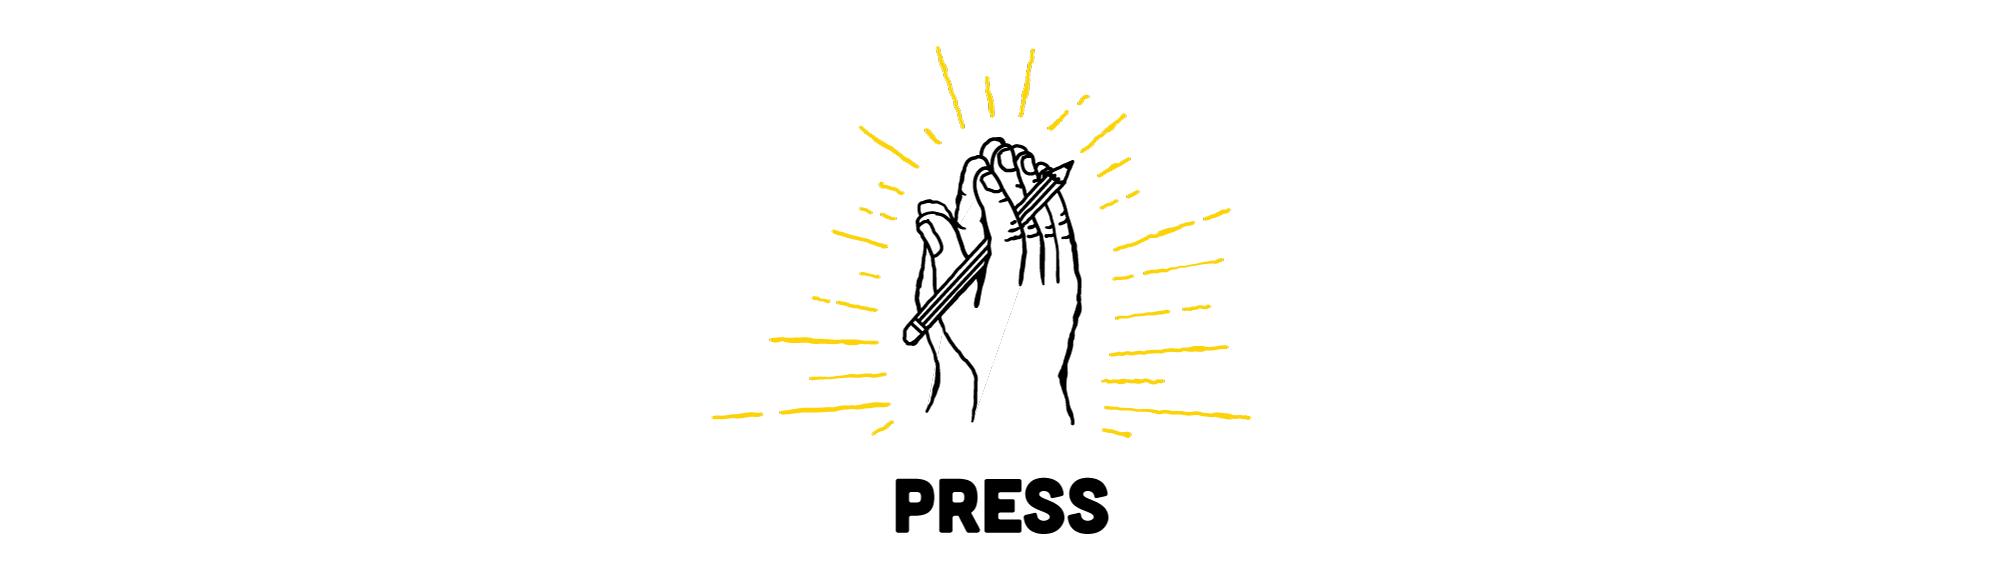 press_website2.png